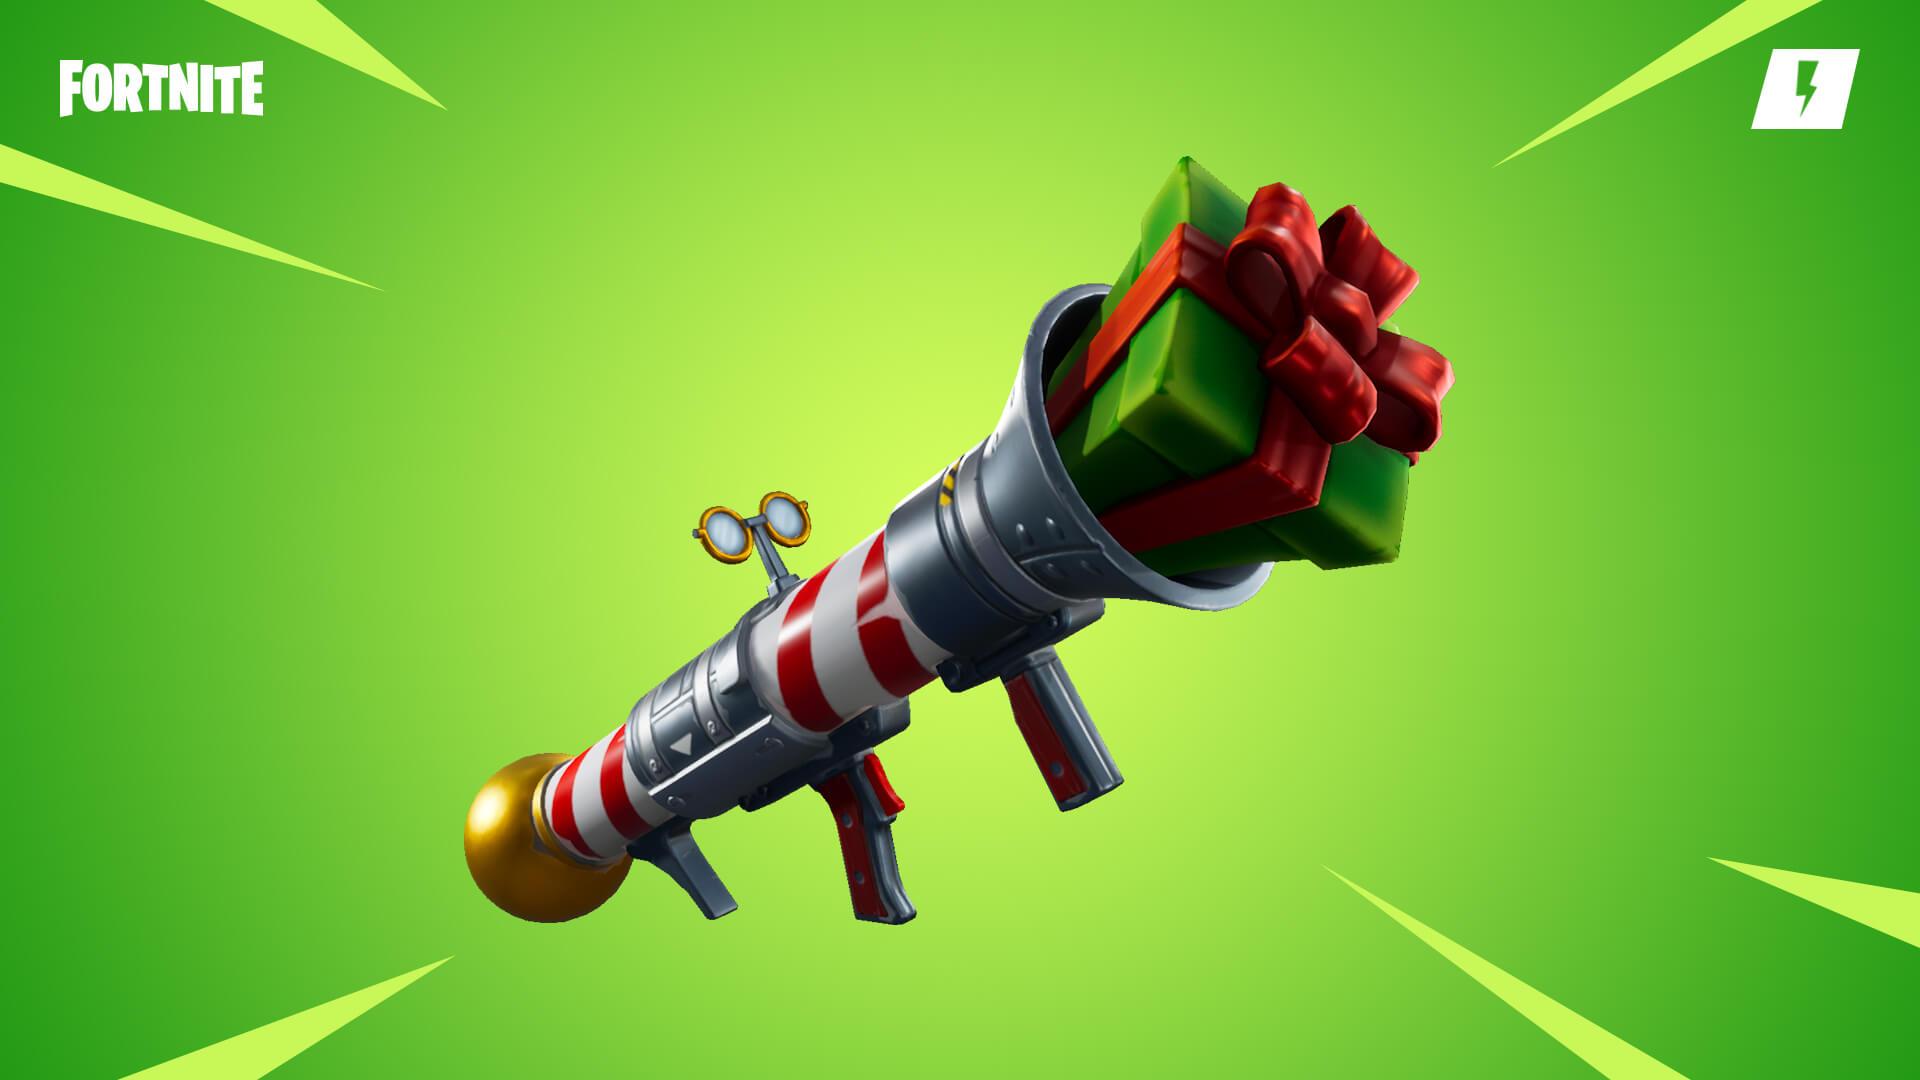 Fortnite Save the World Santa's Little Helper Launcher